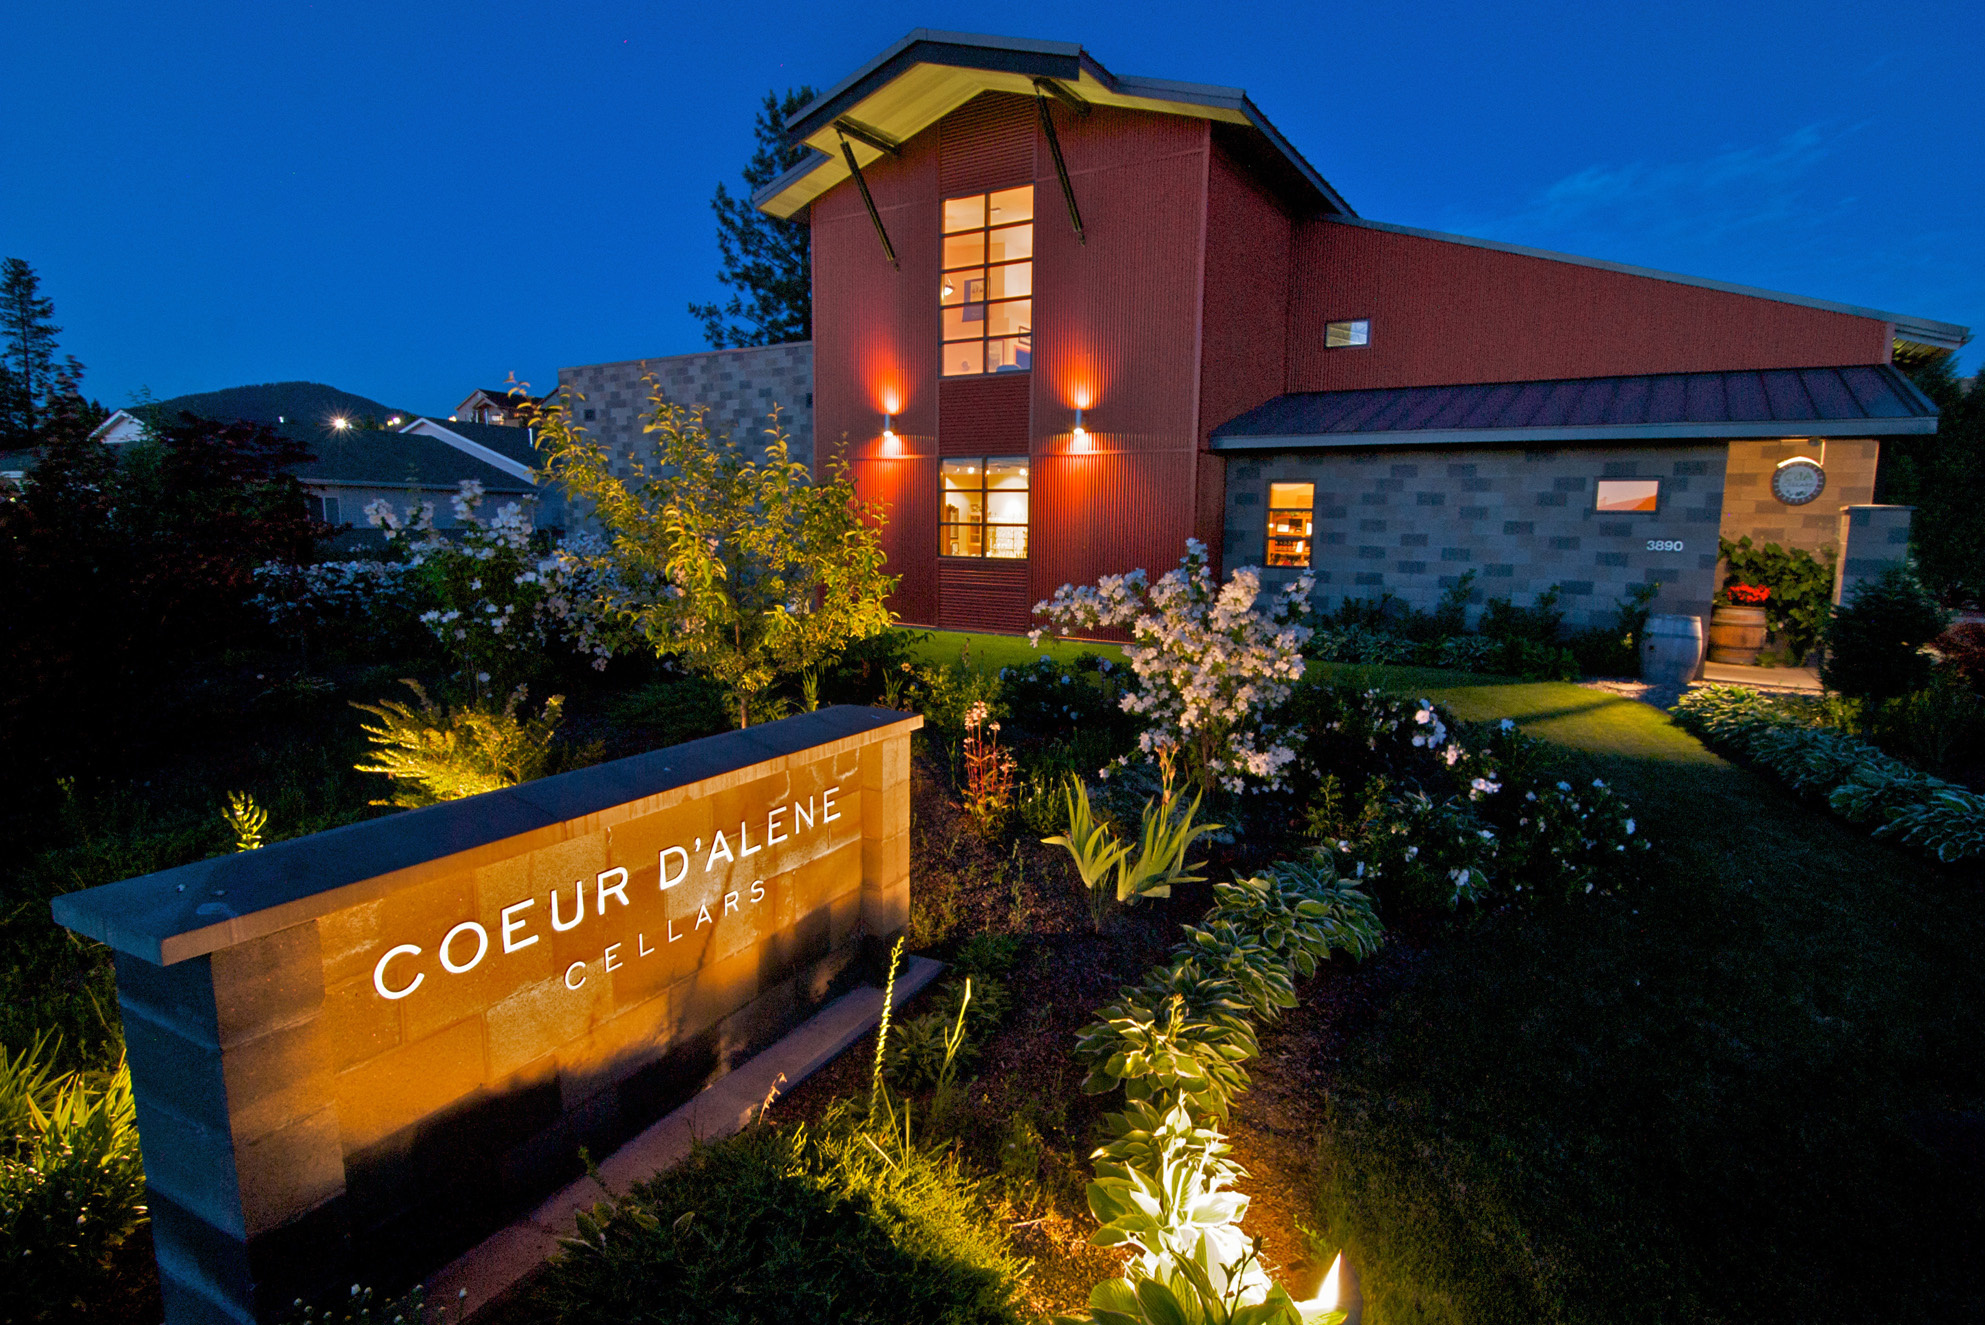 Coeur du0027Alene Cellars makes award-winning wines from Washington grapes. The winery & Coeur du0027Alene Cellars brings Washington wines to Idaho | The ...